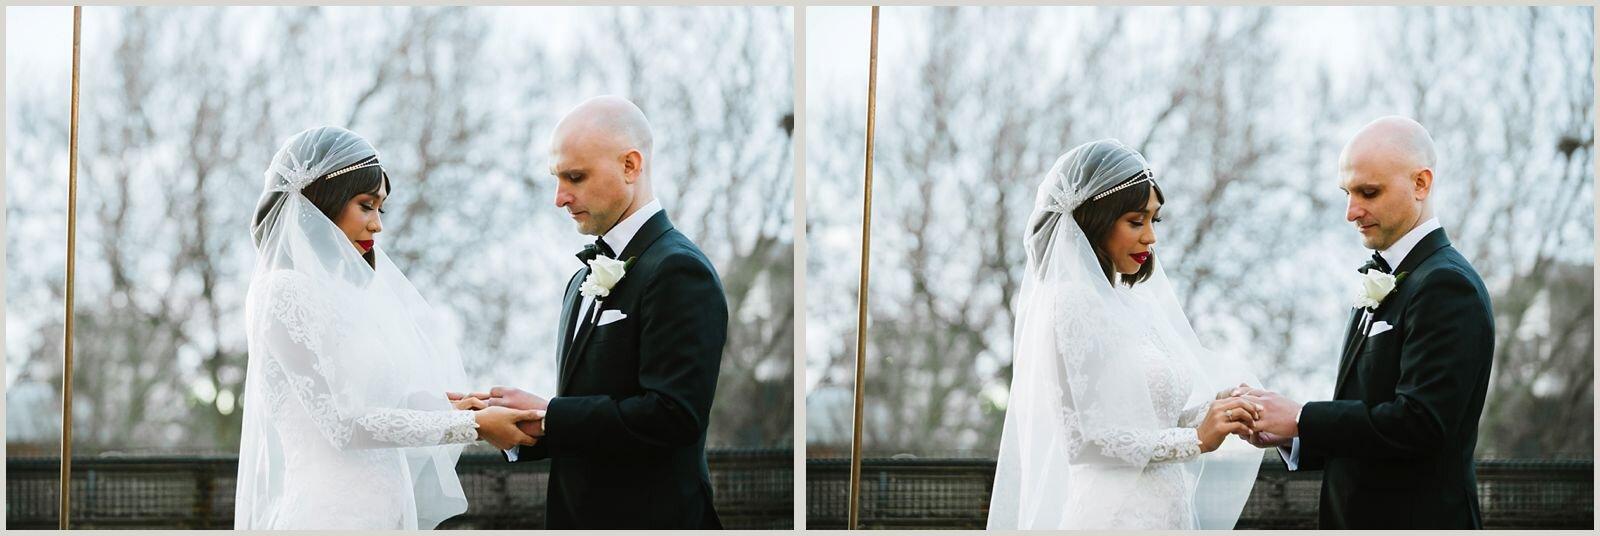 joseph_koprek_wedding_melbourne_the_prince_deck_0061.jpg